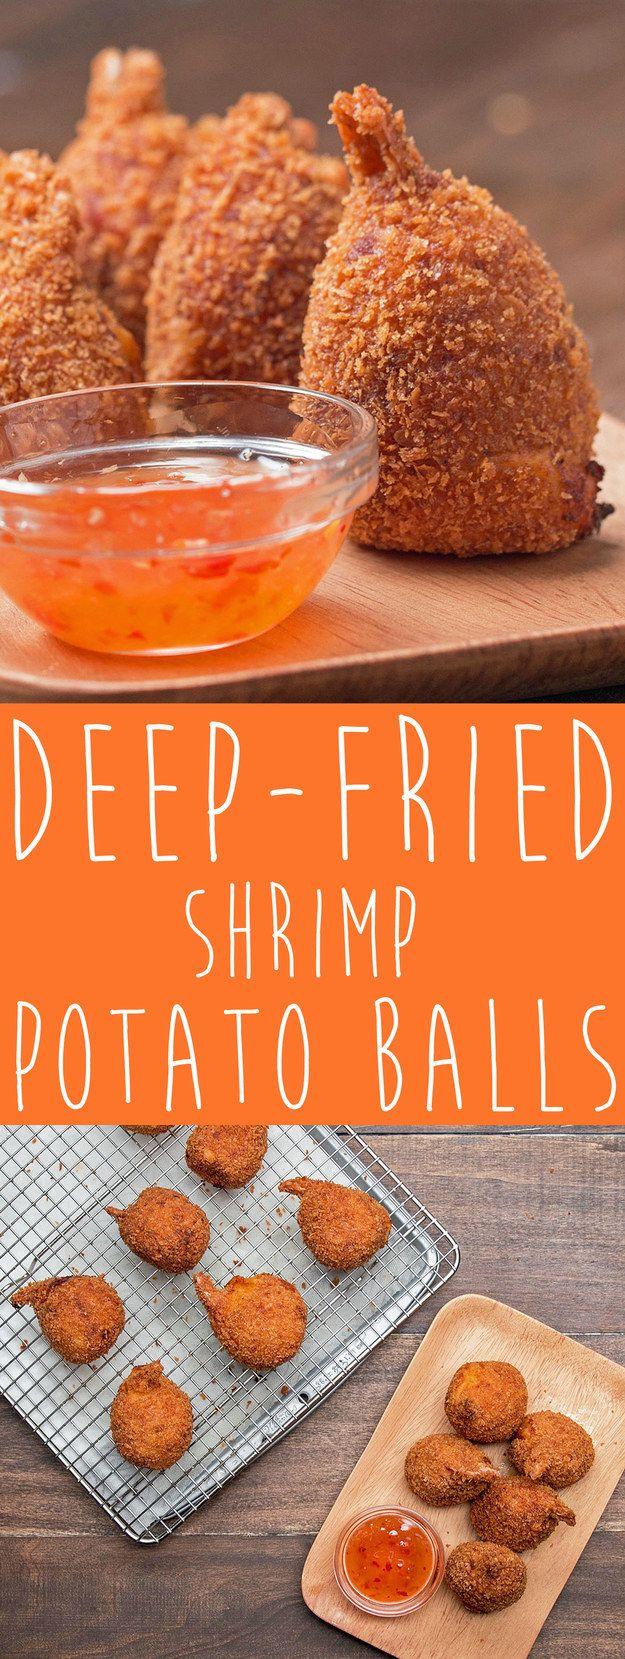 Deep-Fried Shrimp Potato Balls | Trust Your Instincts And Make These Heavenly Deep-Fried Shrimp Potato Balls